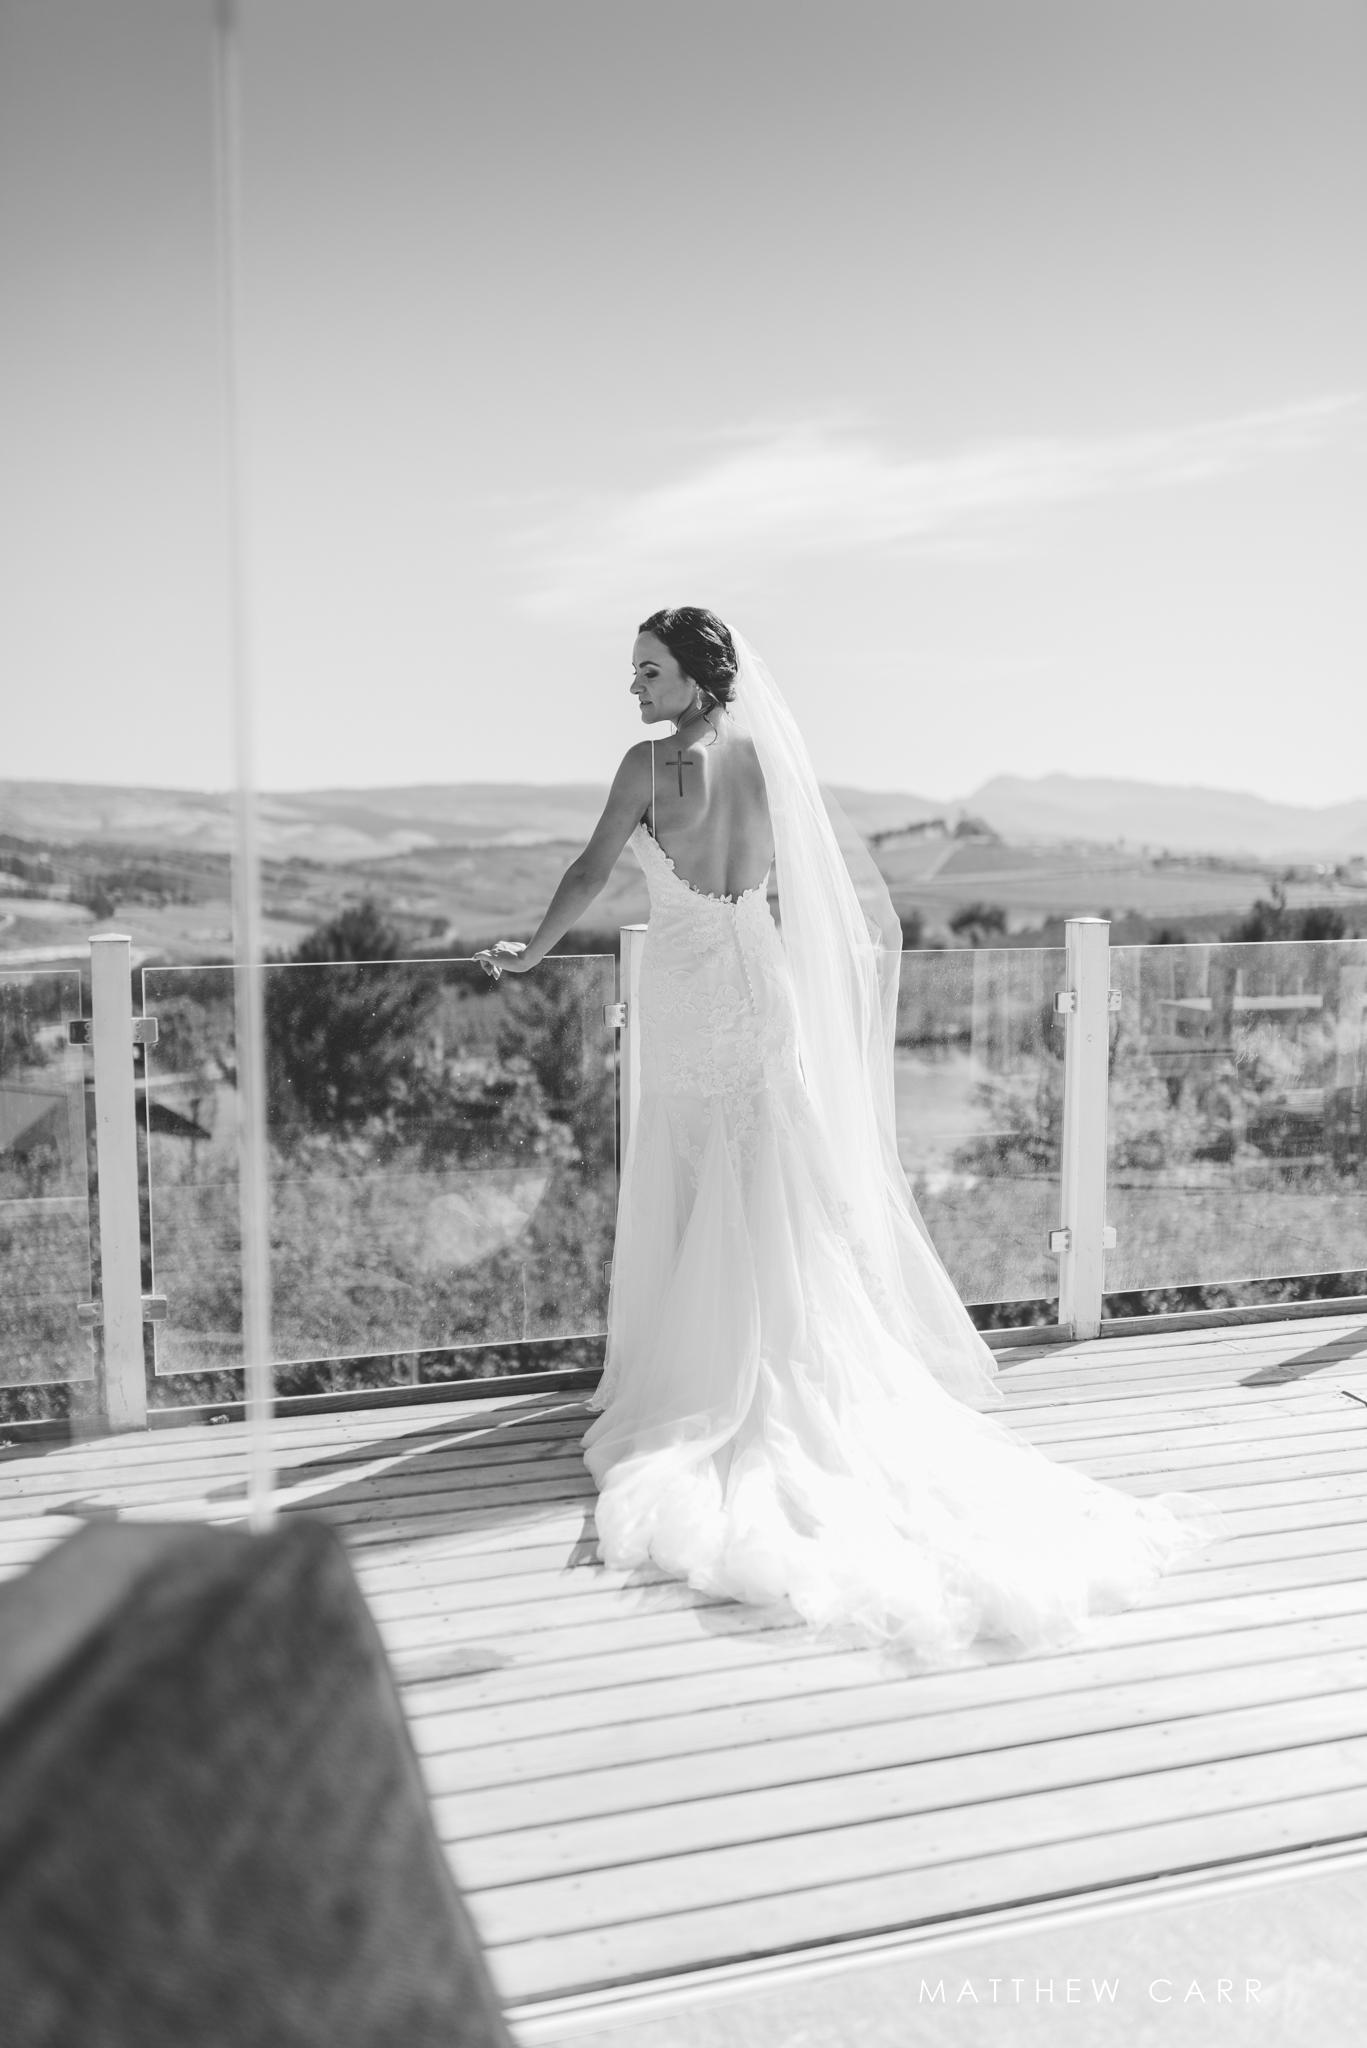 wedding prep - low res (viewing, social media) (276 of 276).JPG